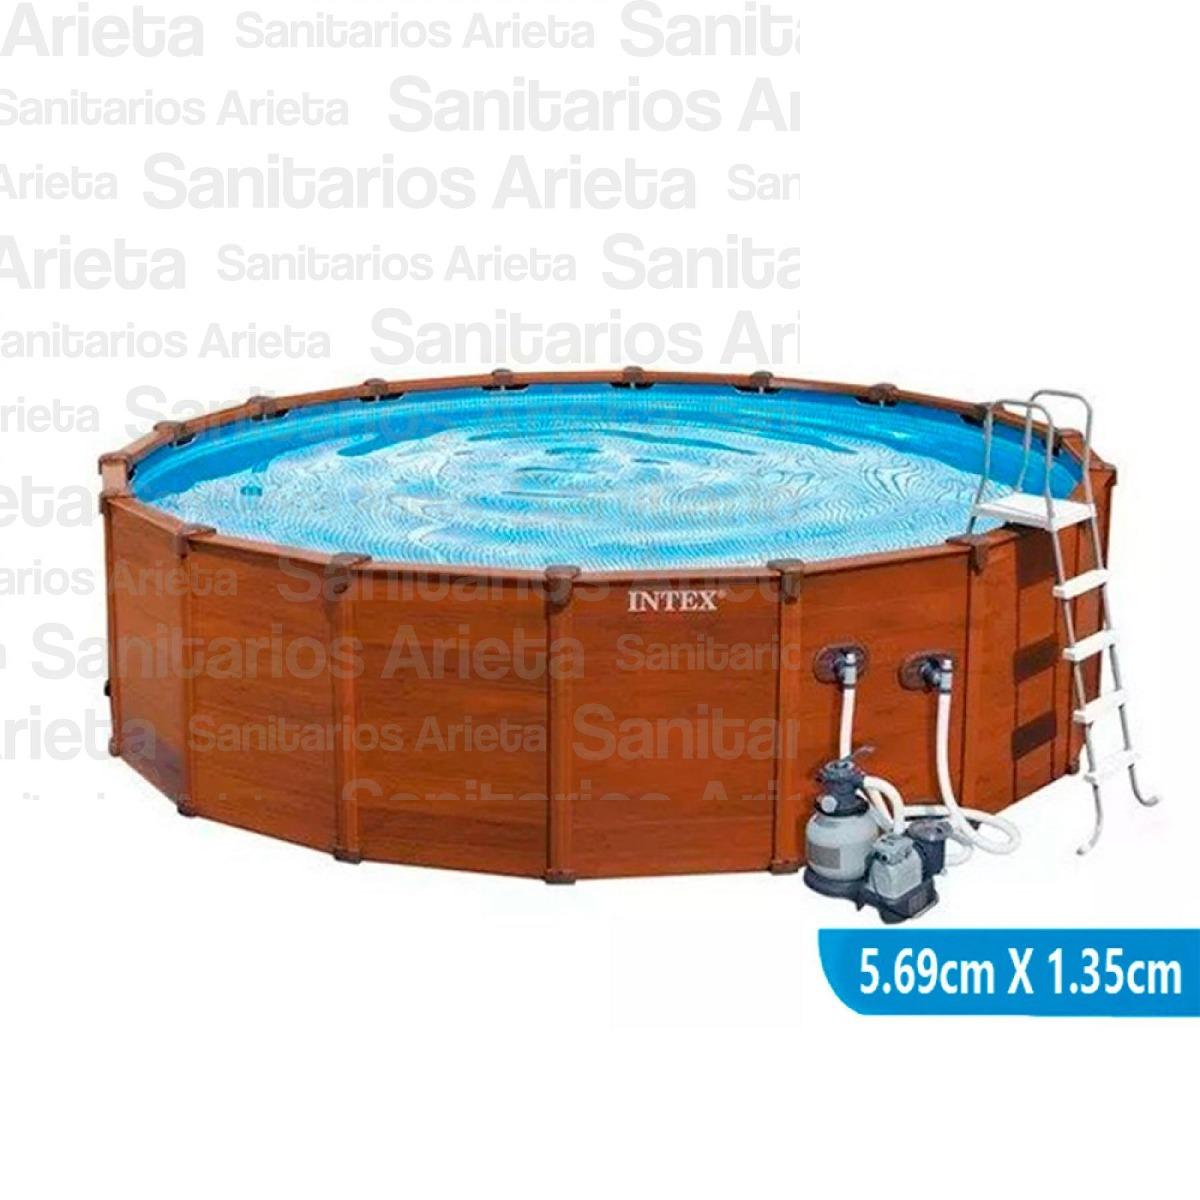 Pileta Intex Estructural Simil Madera 569 X 135 + Accesorios ...